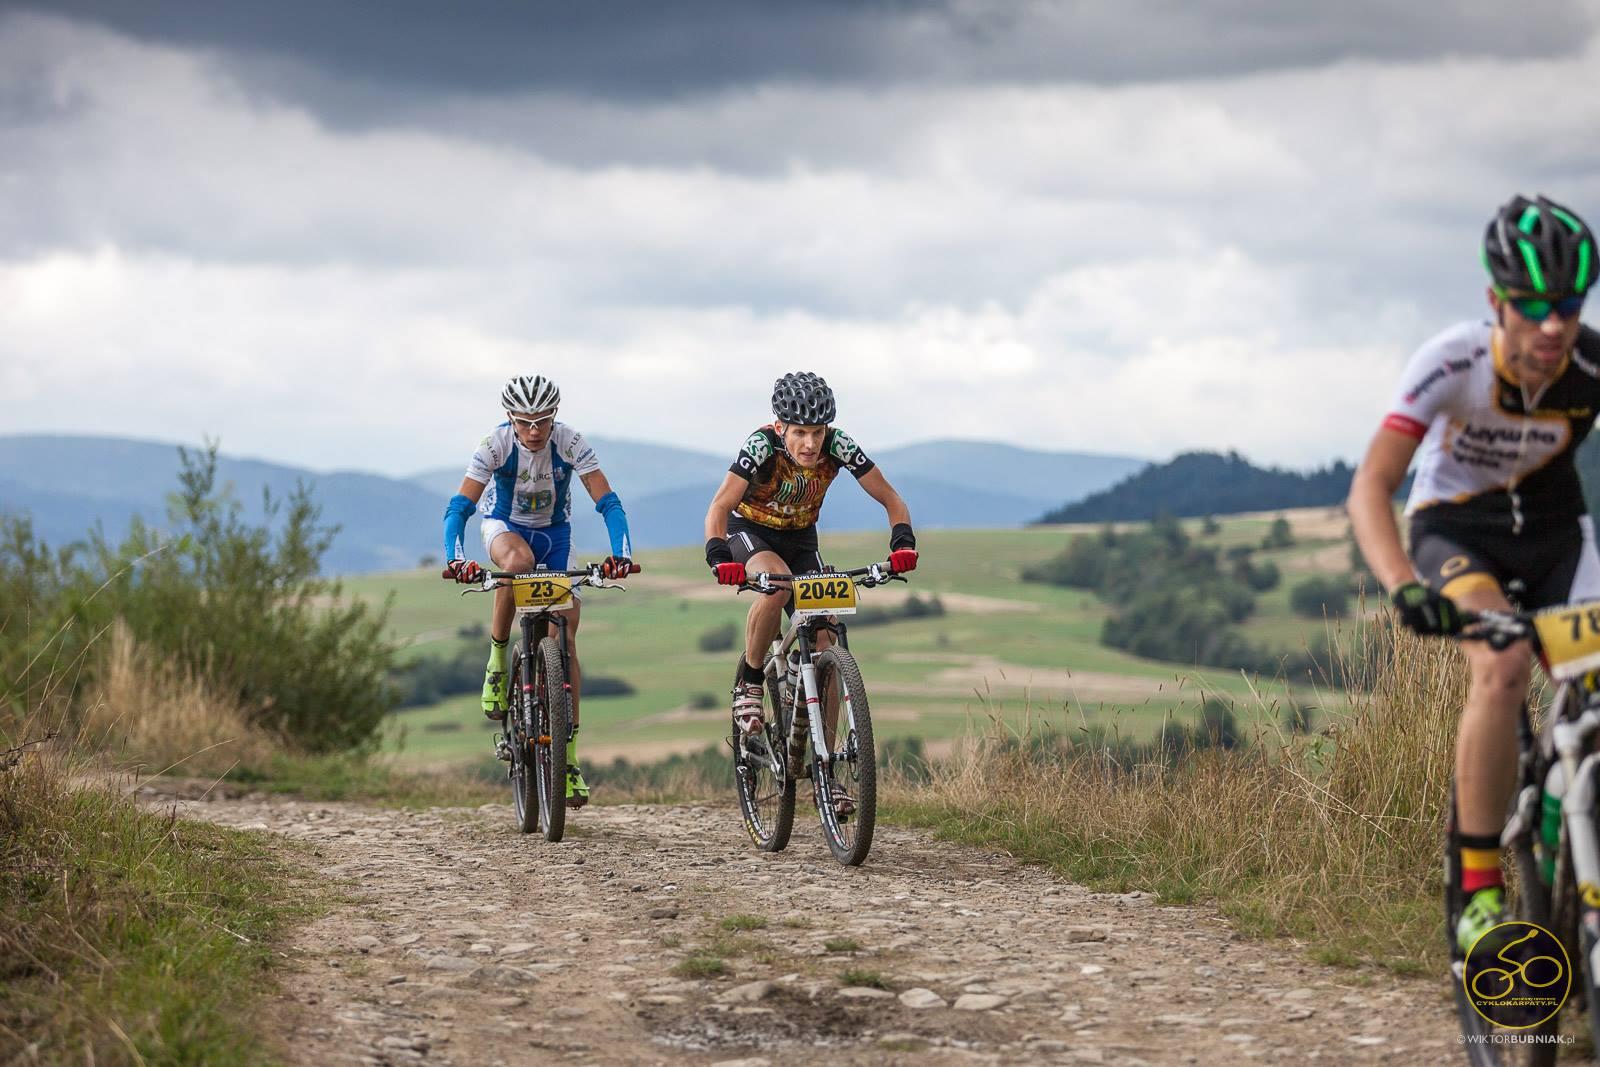 Karol Rożek – AGH Cycling – Cyklokarpaty – Koninki